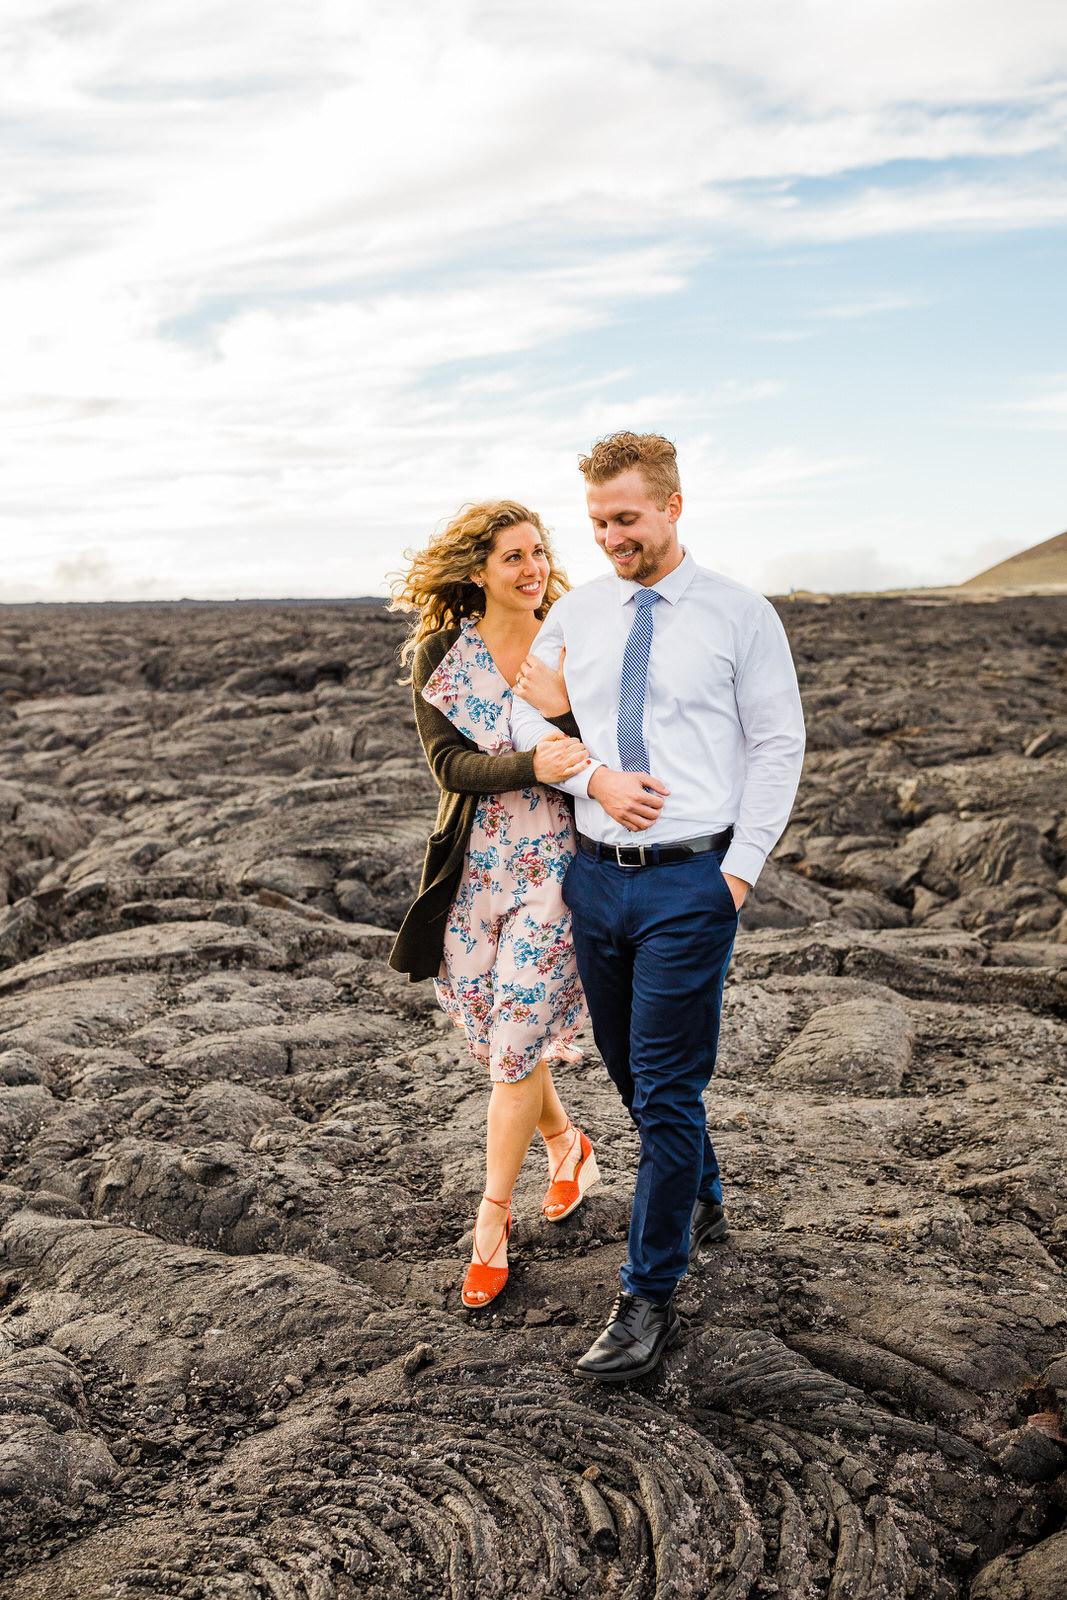 engagements-hilo-happy-couple-big-island-hawaii-6.jpg